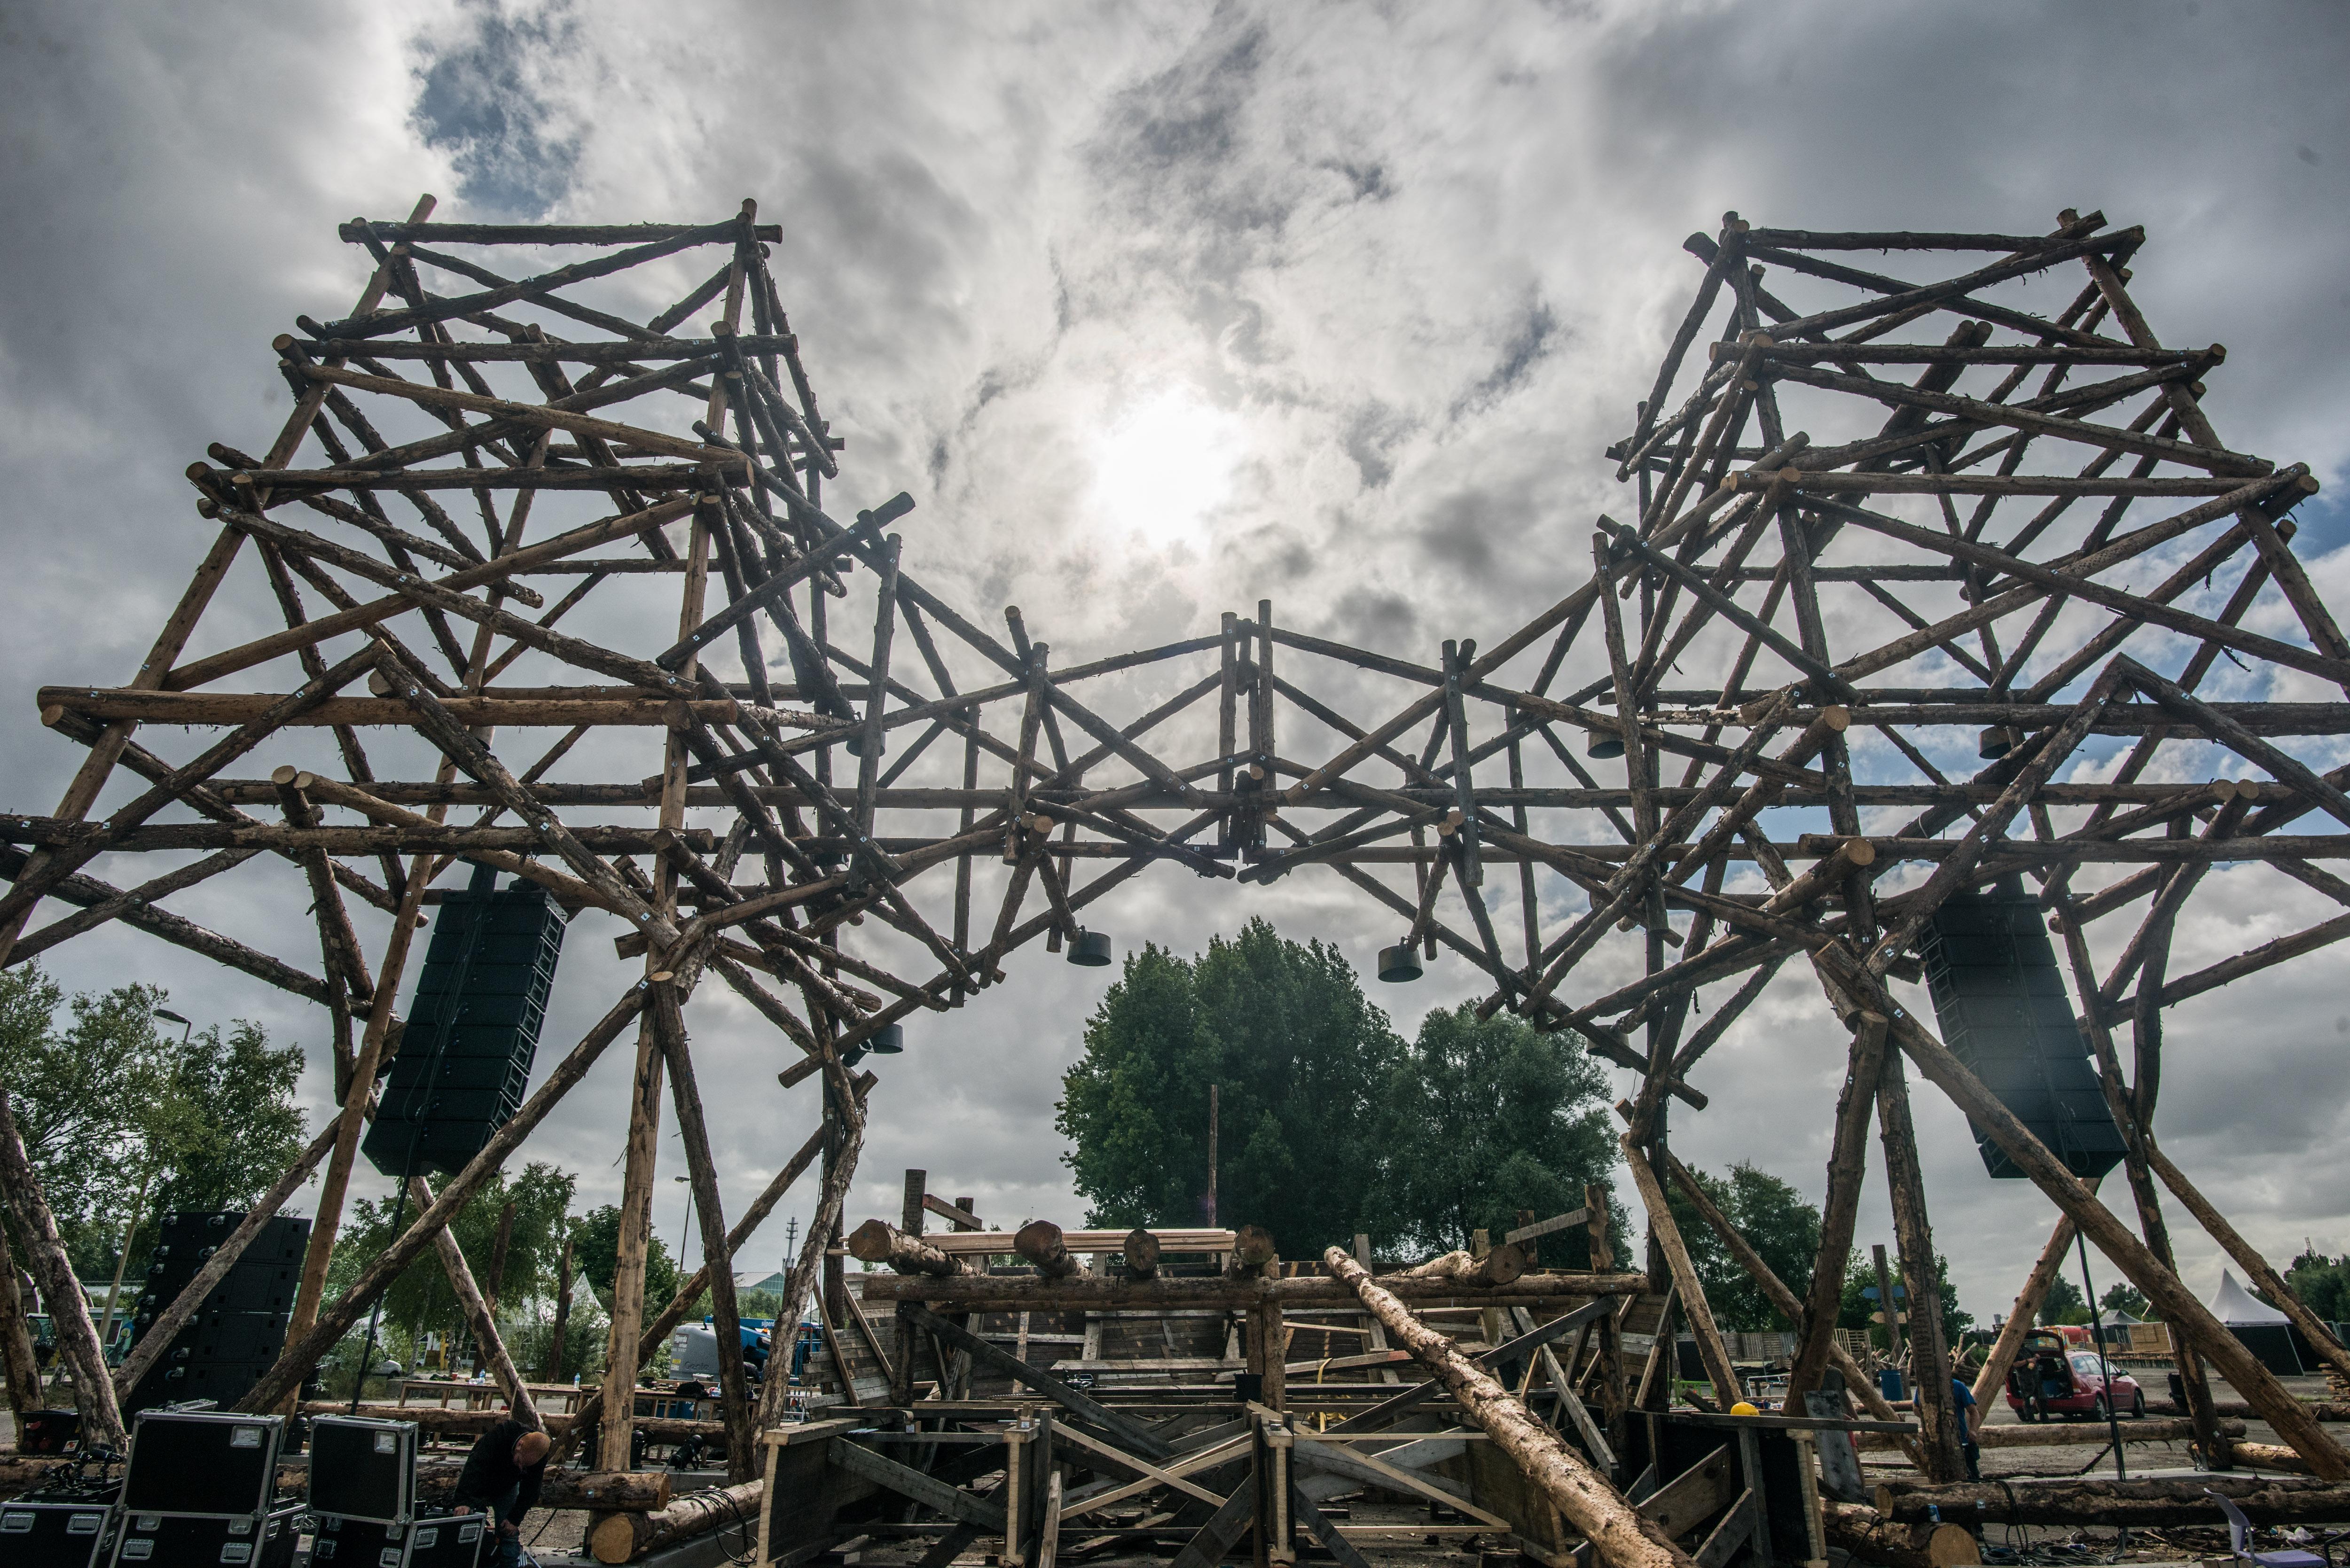 Paradigm Festival: 72-Stunden-Rave nimmt Form an